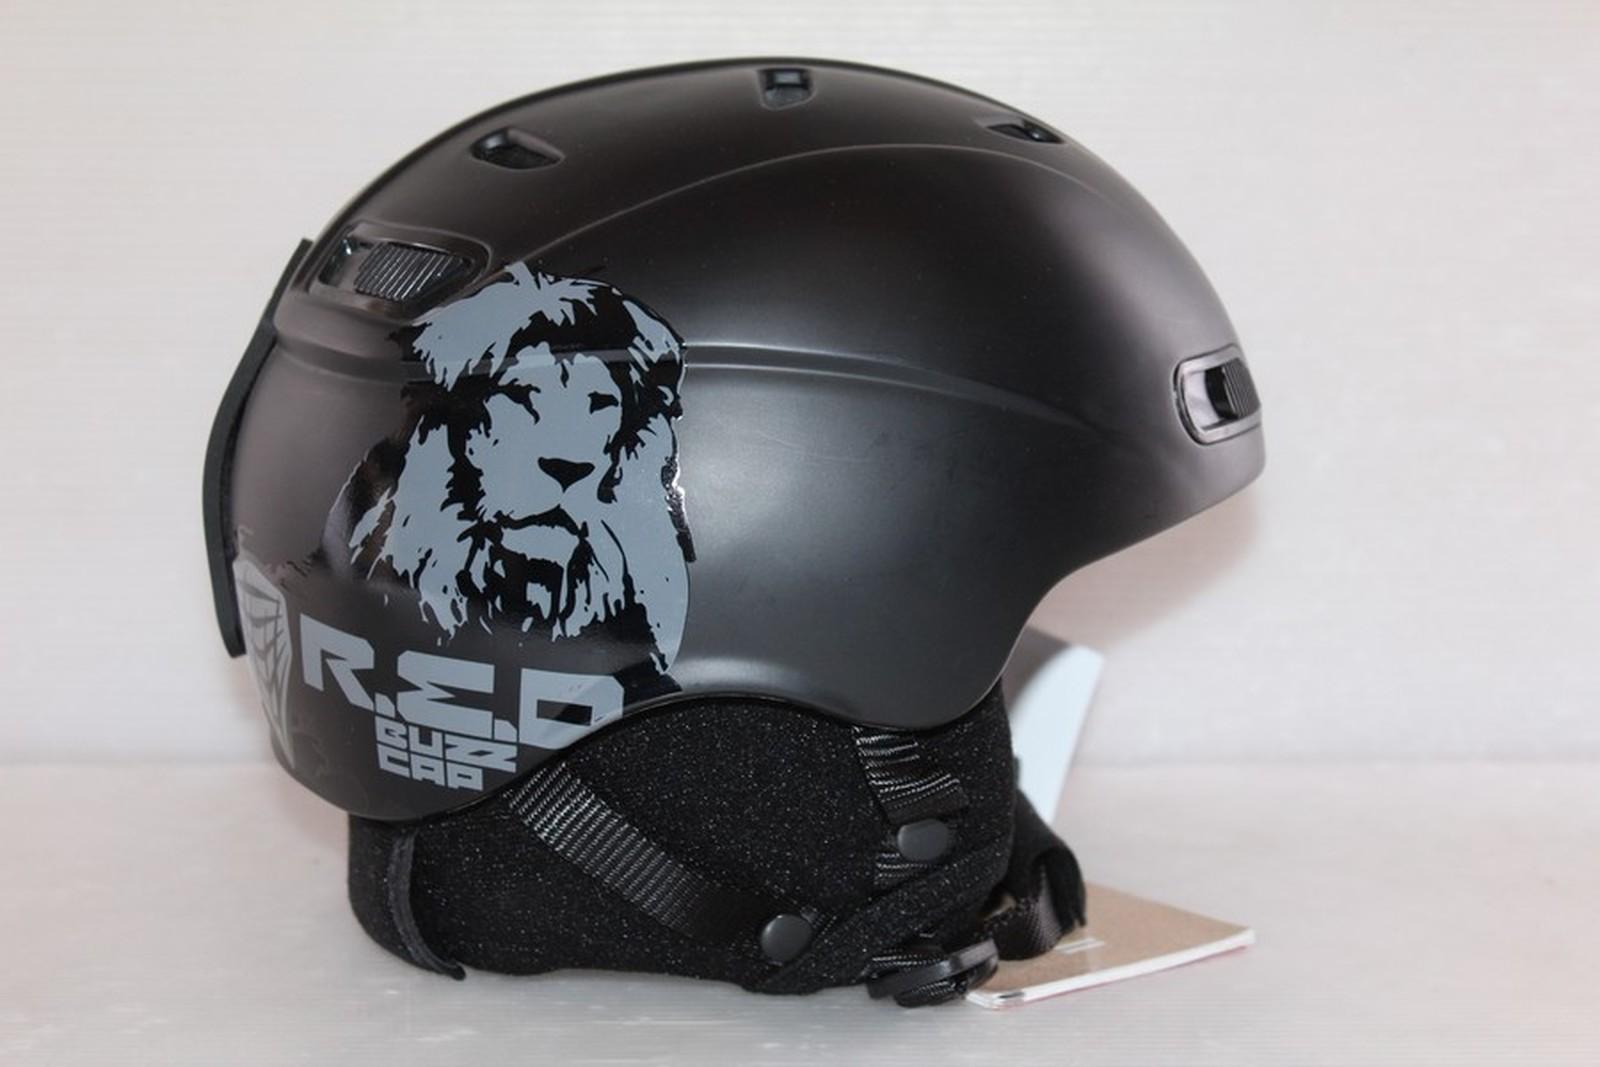 Dámská lyžařská helma RED Buzz-cap posuvná - posuvná vel. 51 - 53